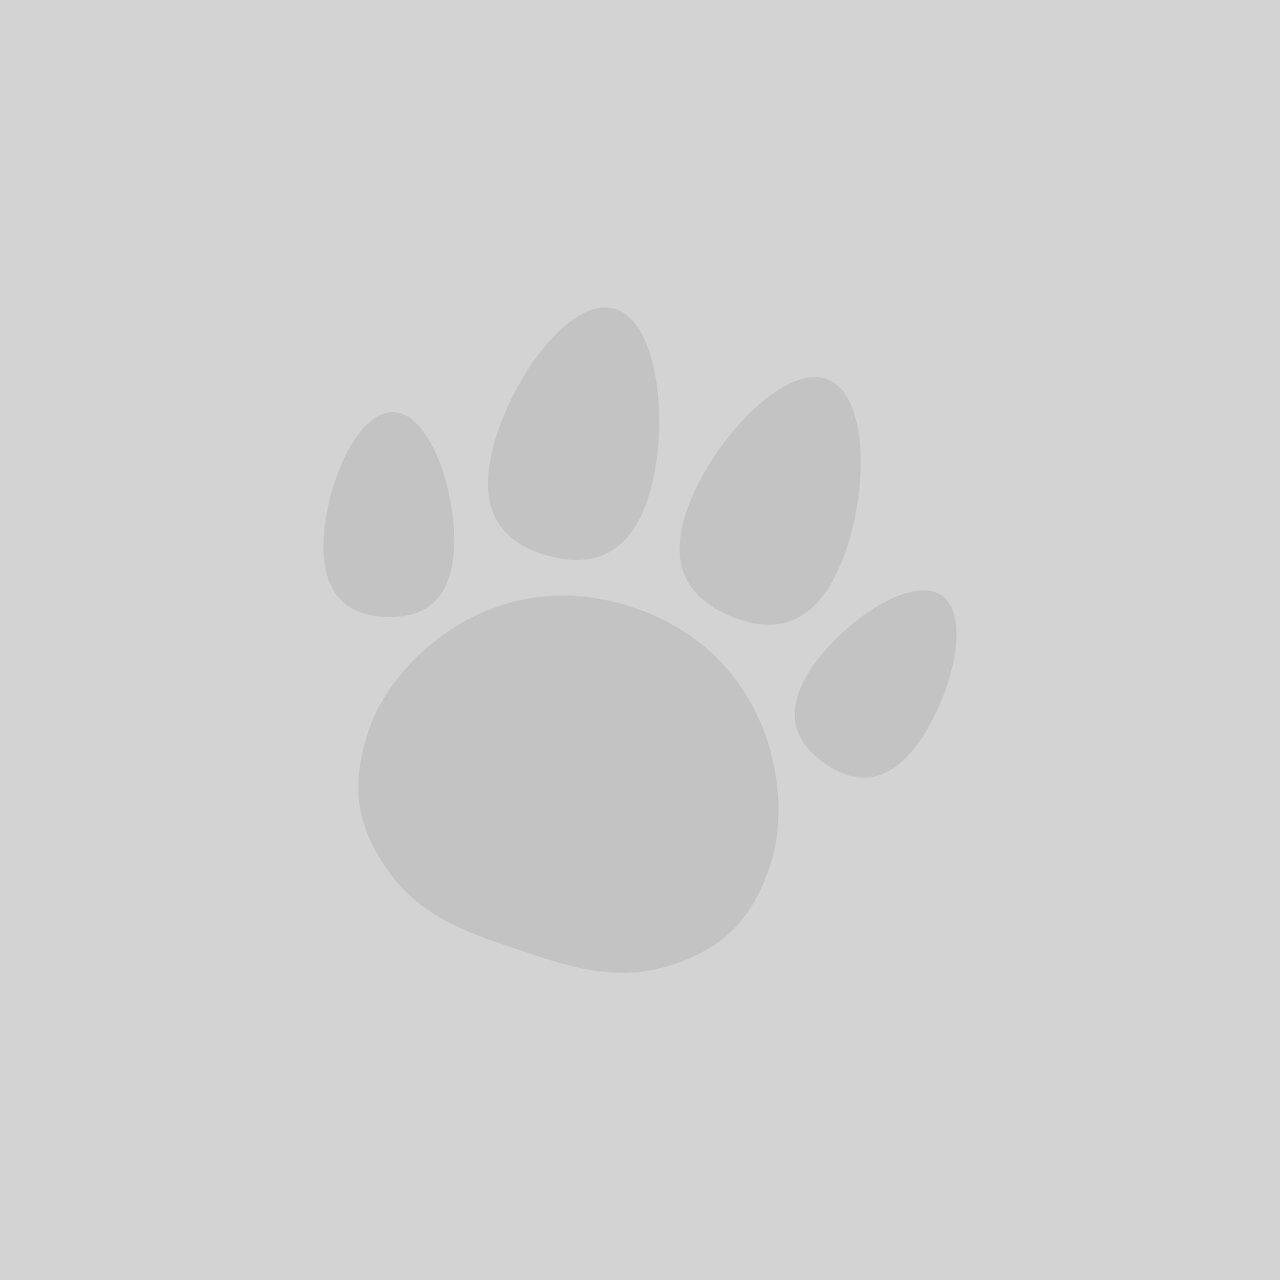 Sonny Classic Indigo Plastic Dog Bed 65cm